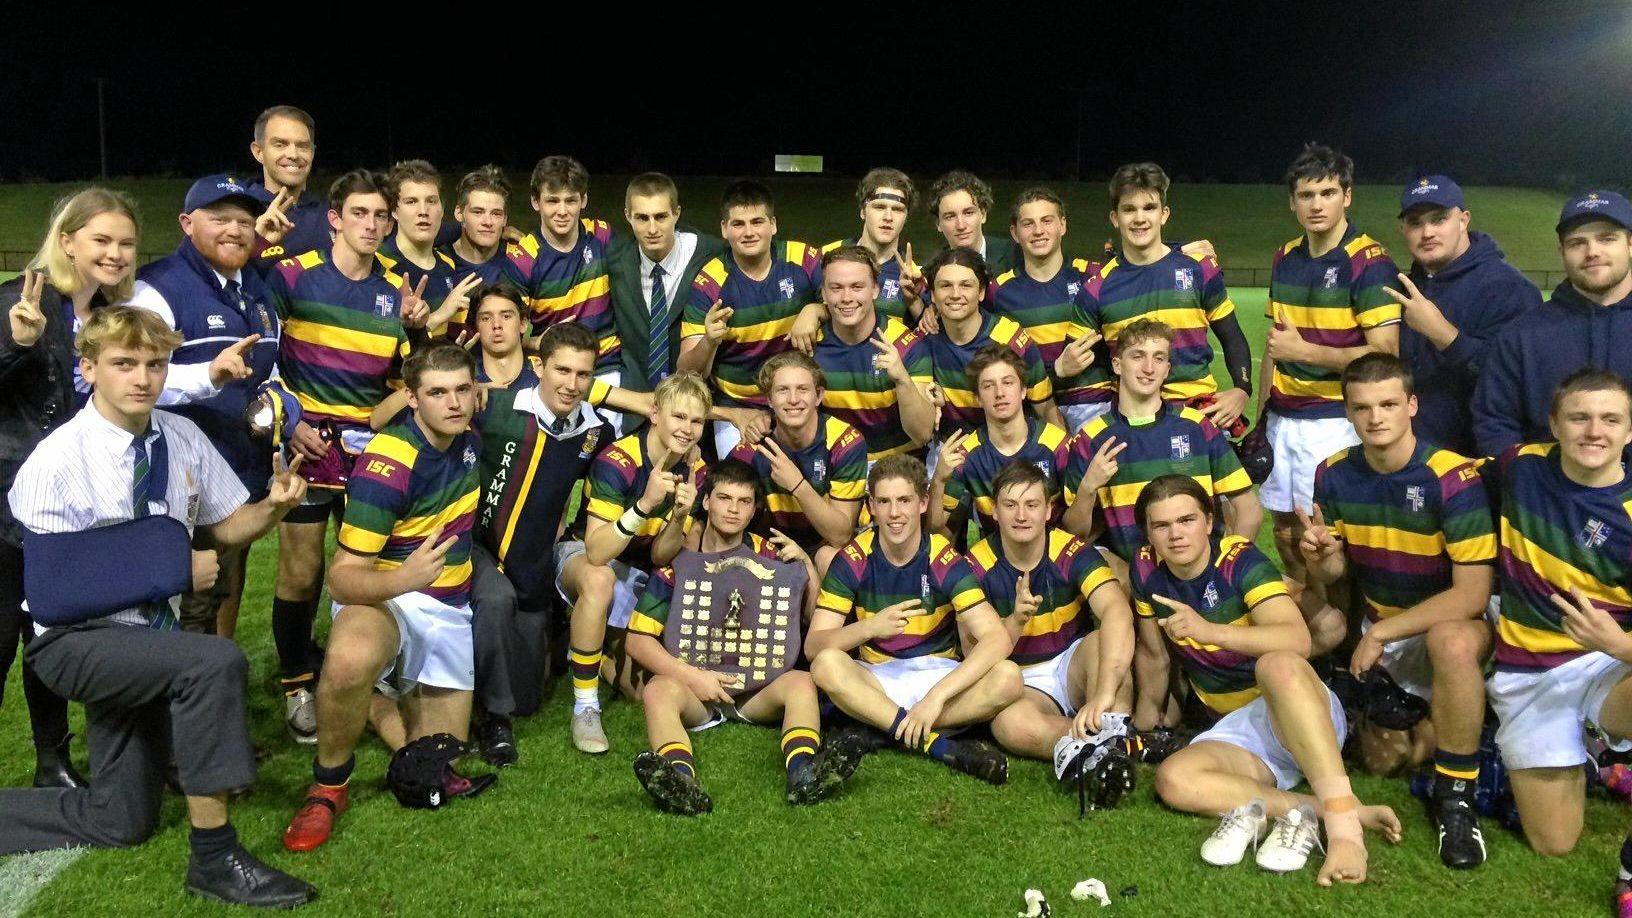 CHAMPS: Sunshine Coast Grammar won the Garth Hunt Shield after downing Siena Catholic College in the First XV grand final at Sunshine Coast Stadium on Wednesday night.